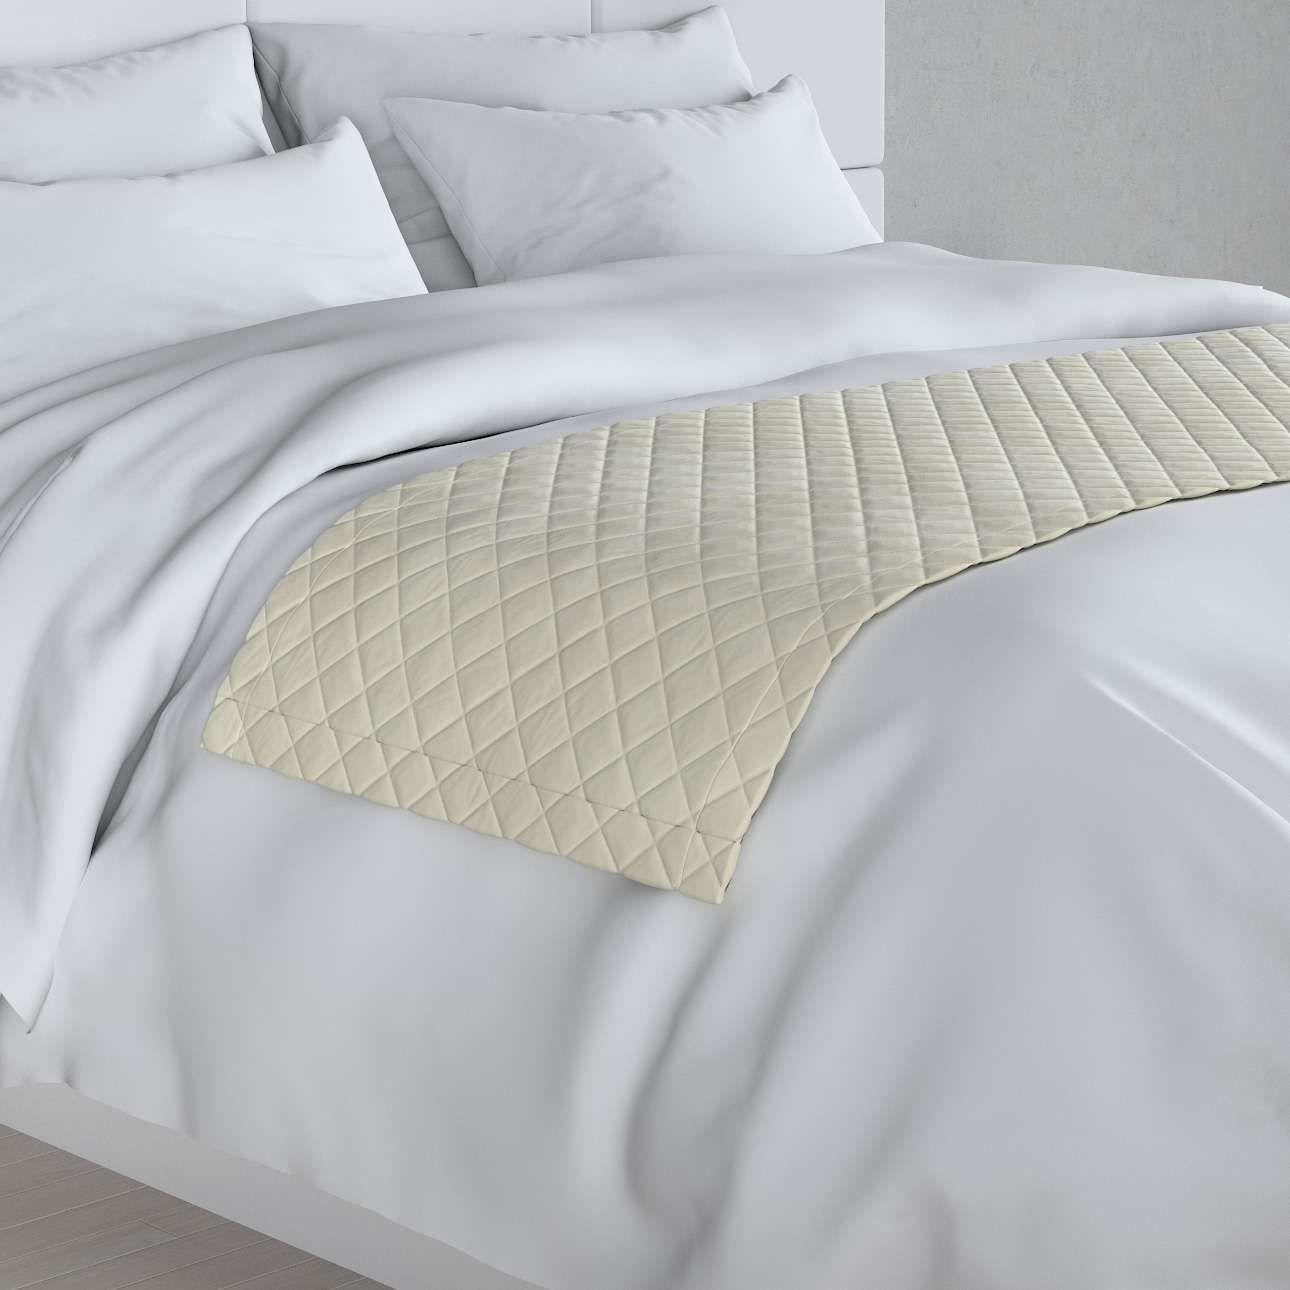 Narzuta hotelowa bieżnik Velvet 60x200cm, śmietankowa biel, 60 x 200 cm, Velvet